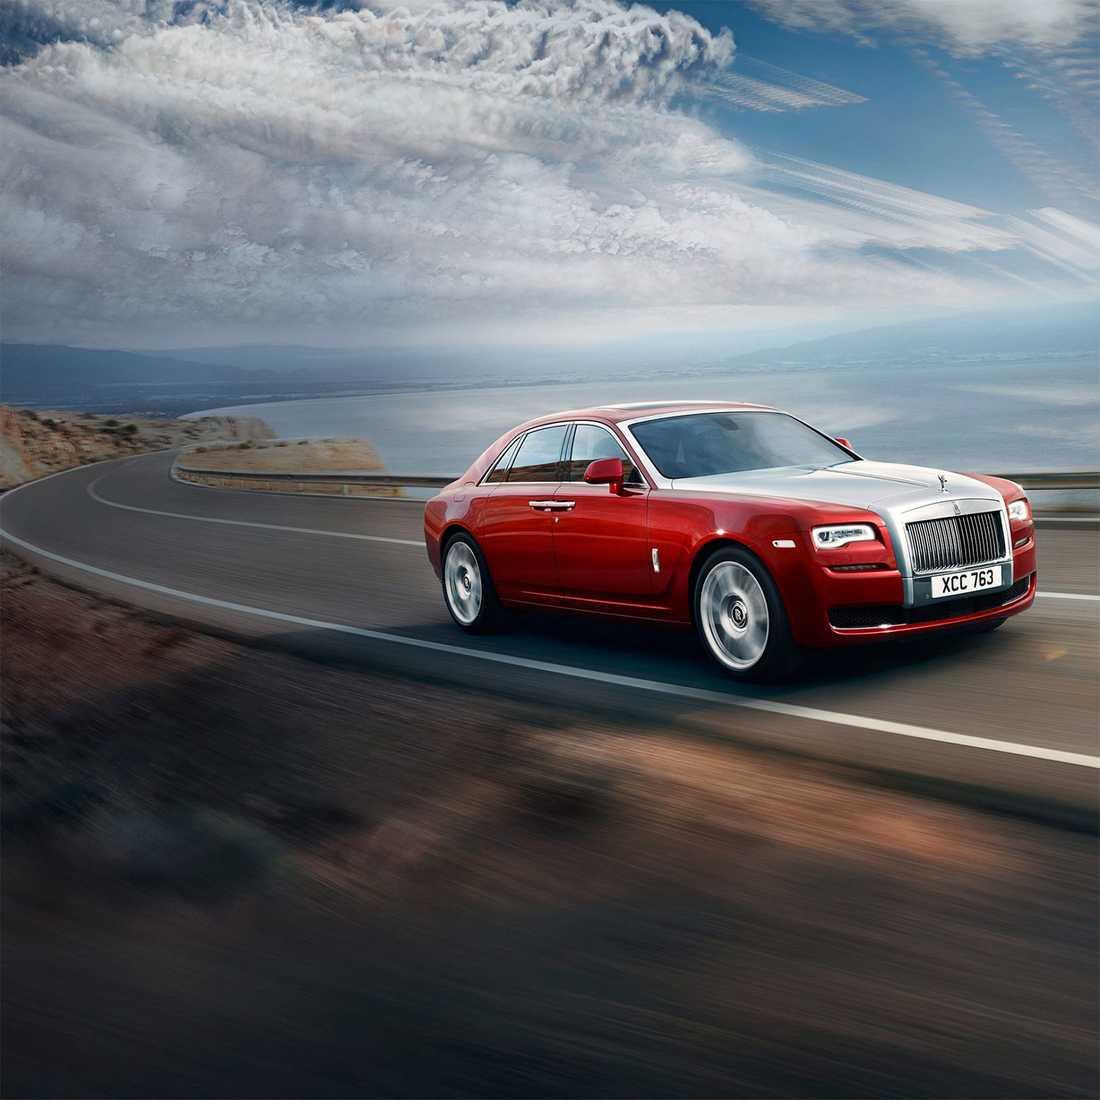 En bil av modellen Ghost återkallade Rolls Royce.